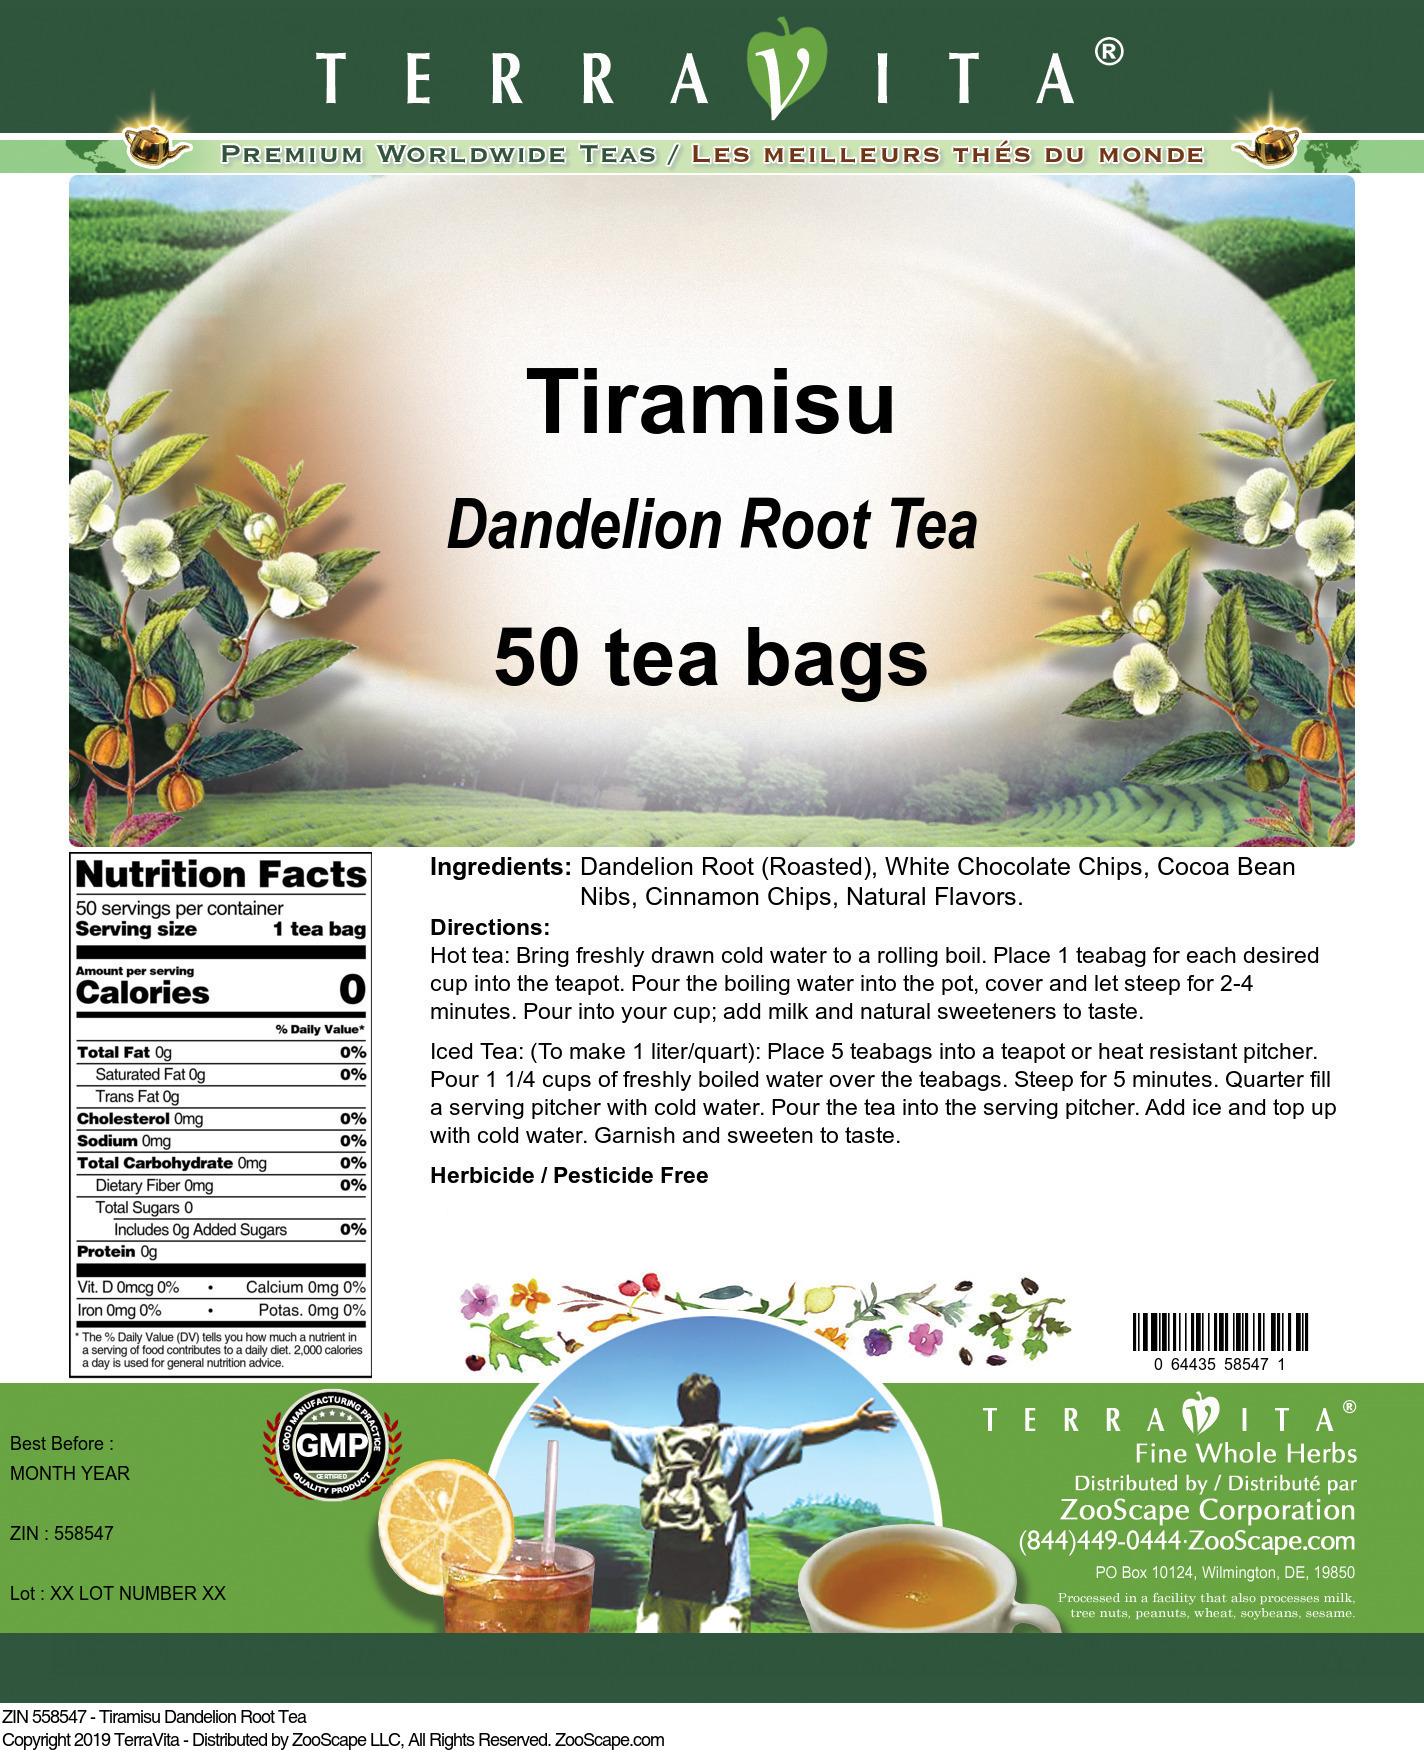 Tiramisu Dandelion Root Tea